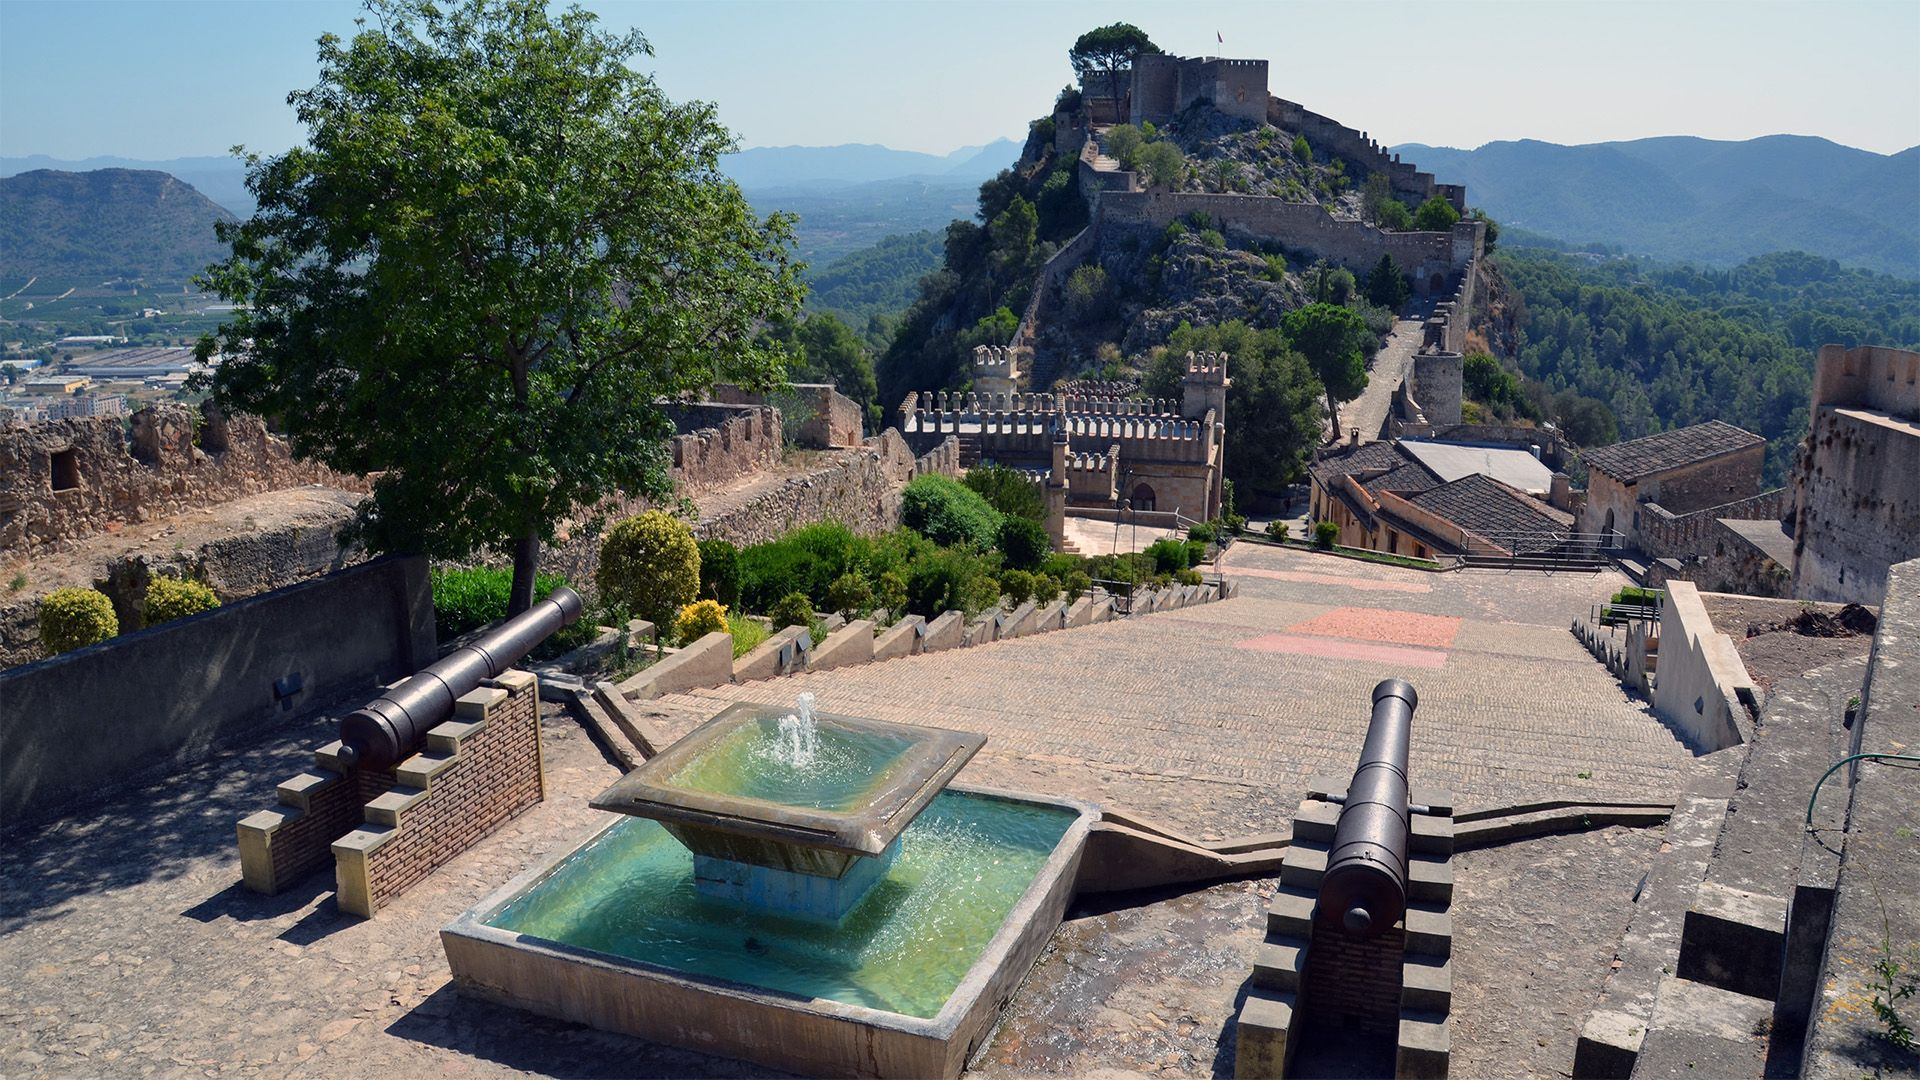 Guided Tour Jativa - the City of Borgia Popes